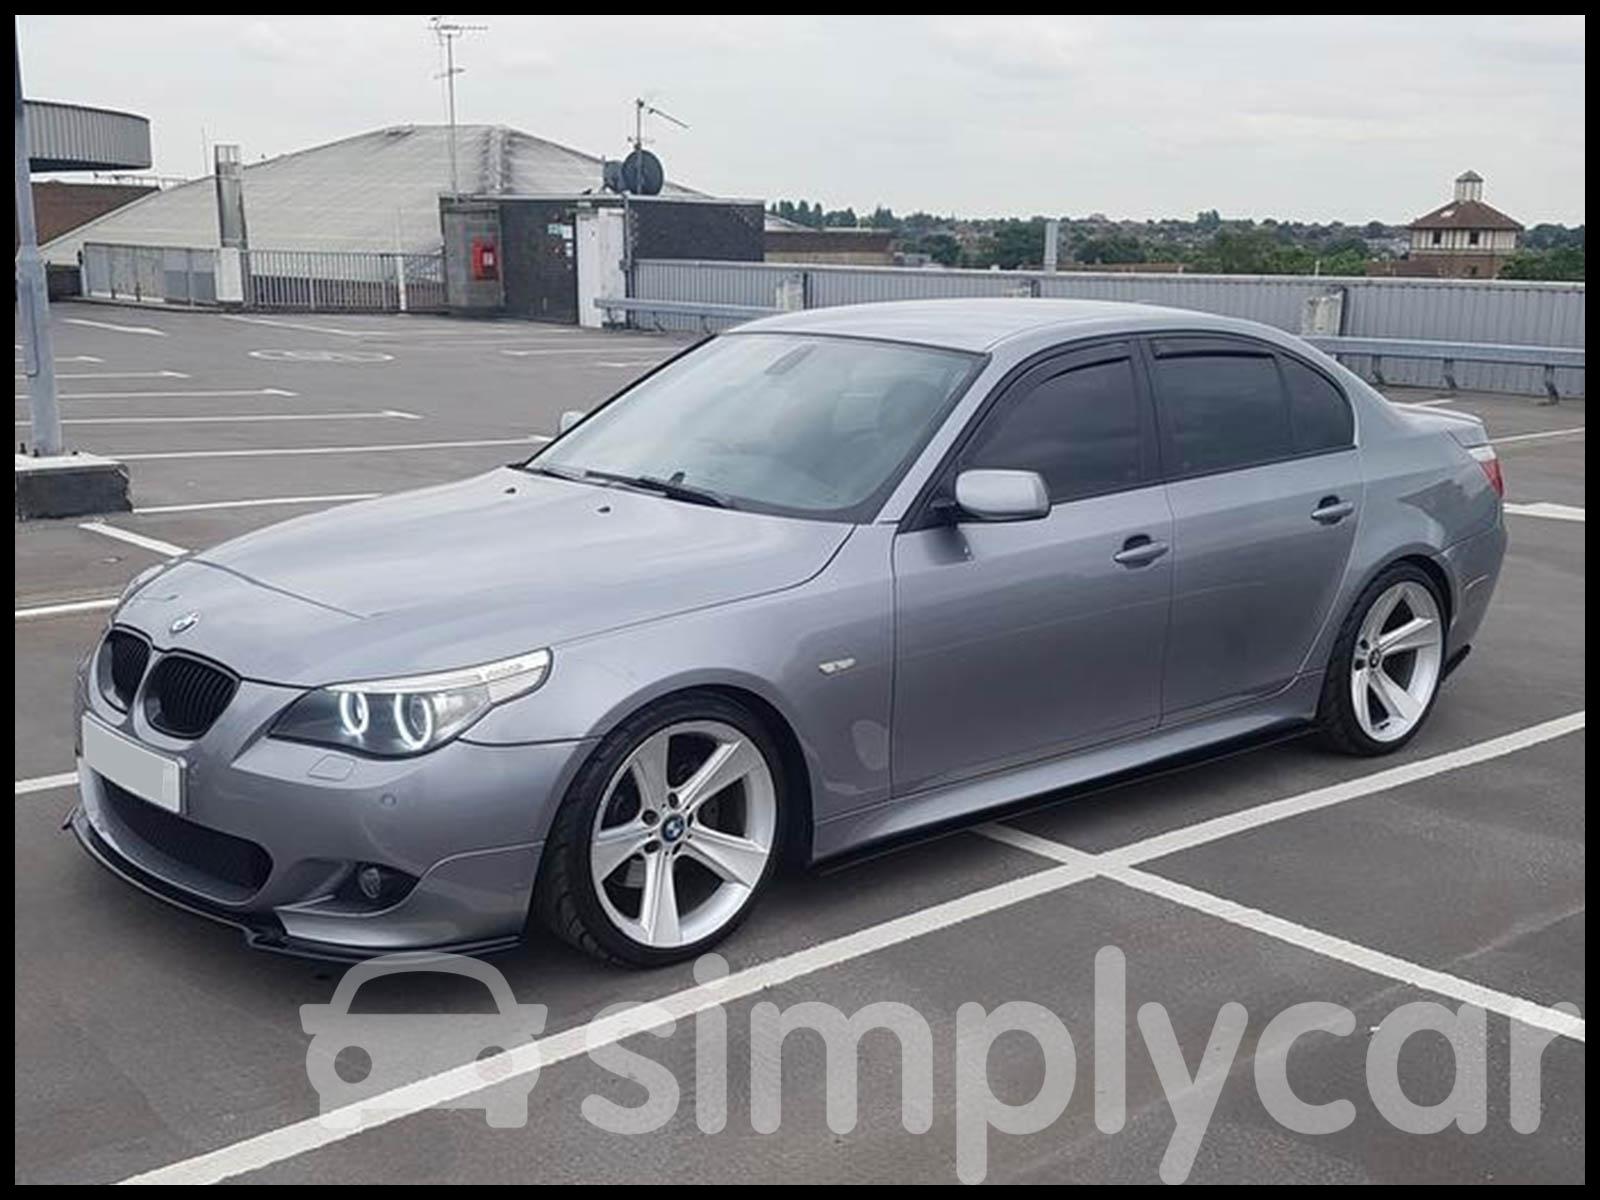 Tinted Front & Rear Window 4pc Set Heko Wind Deflectors BMW 5 Series E60 03